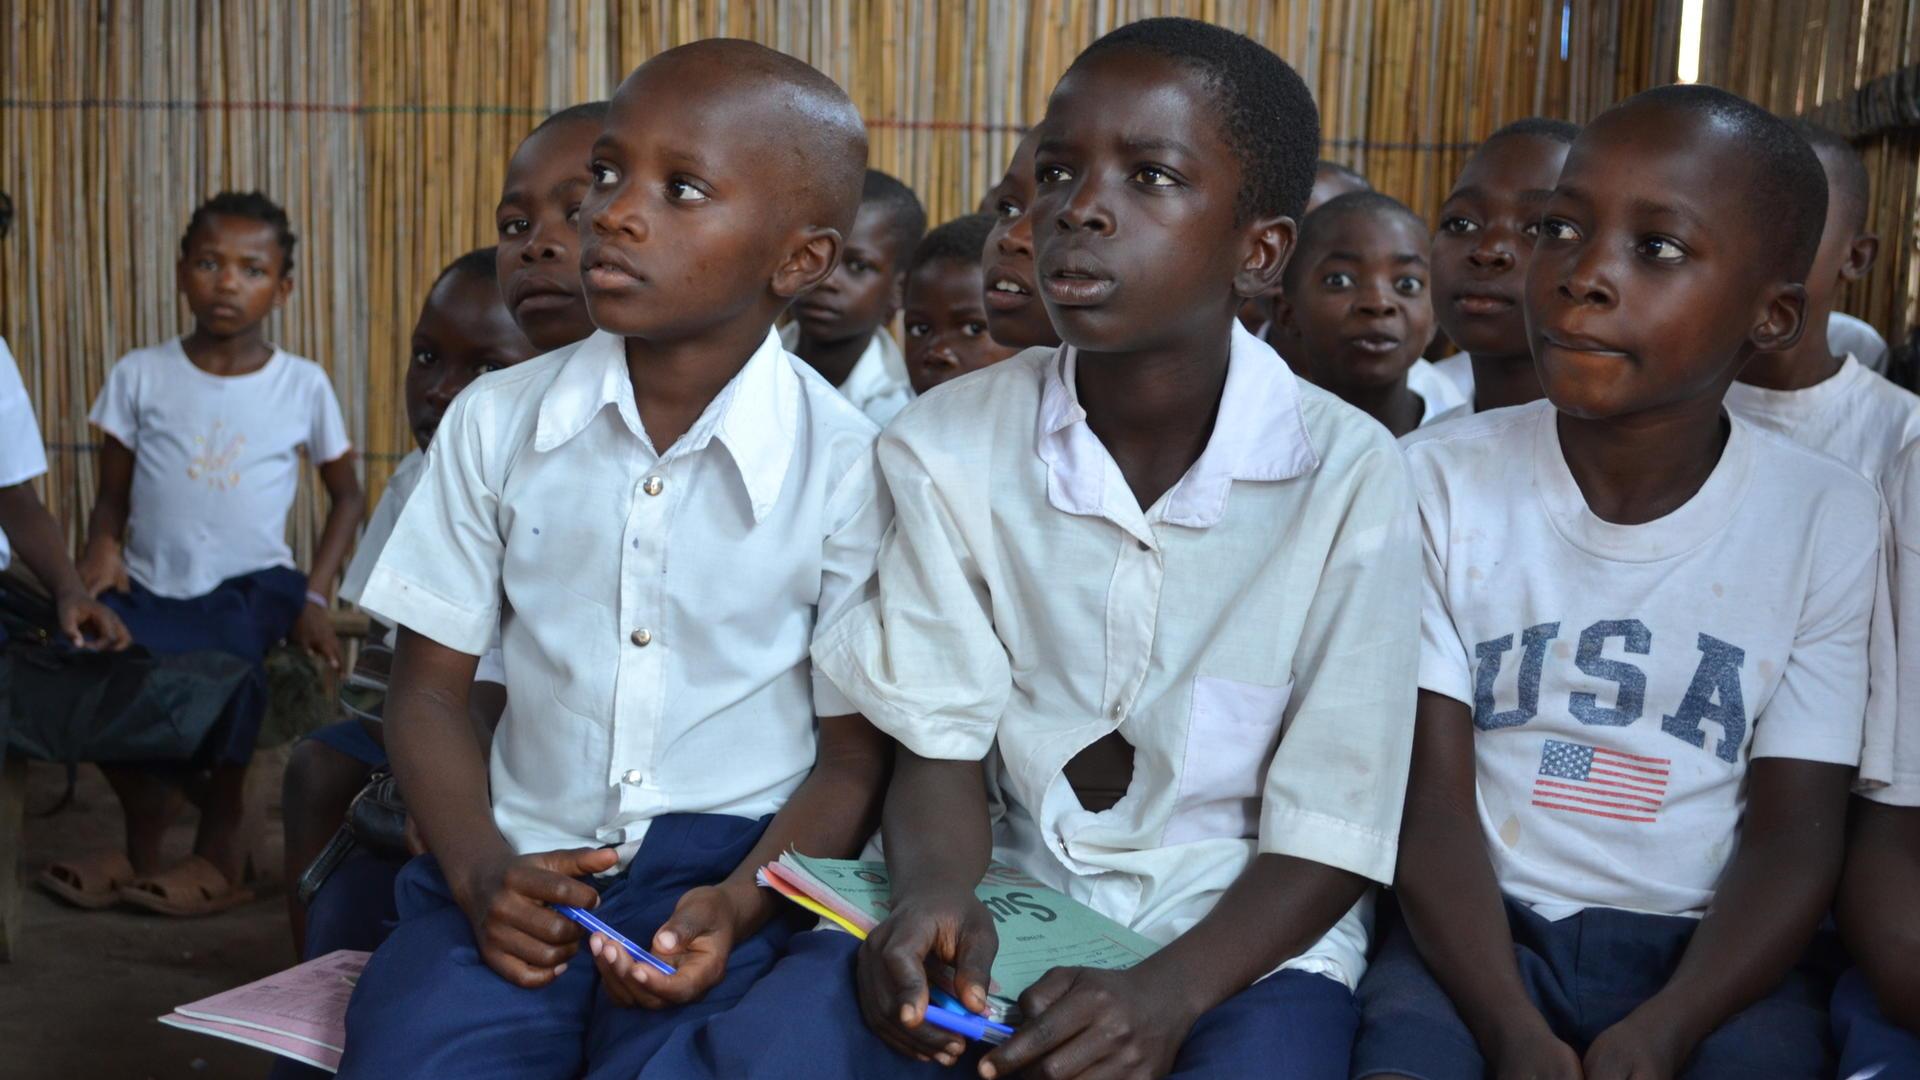 Congolese children at school